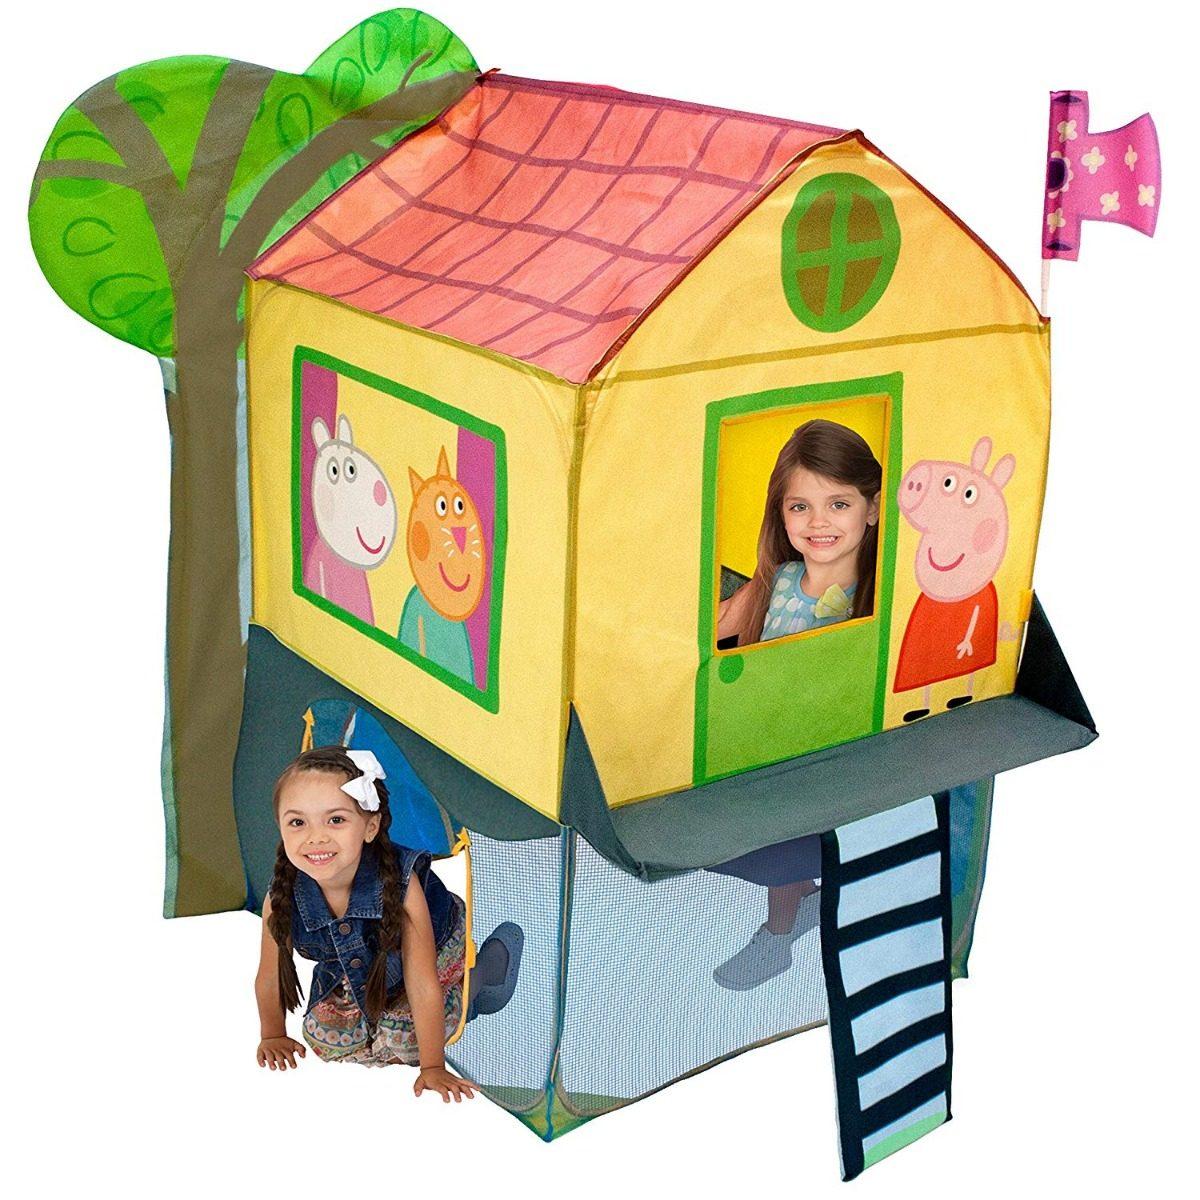 Casa Juegos Para Ninas Playhut Peppa Pig Envio Gratis 1 260 00